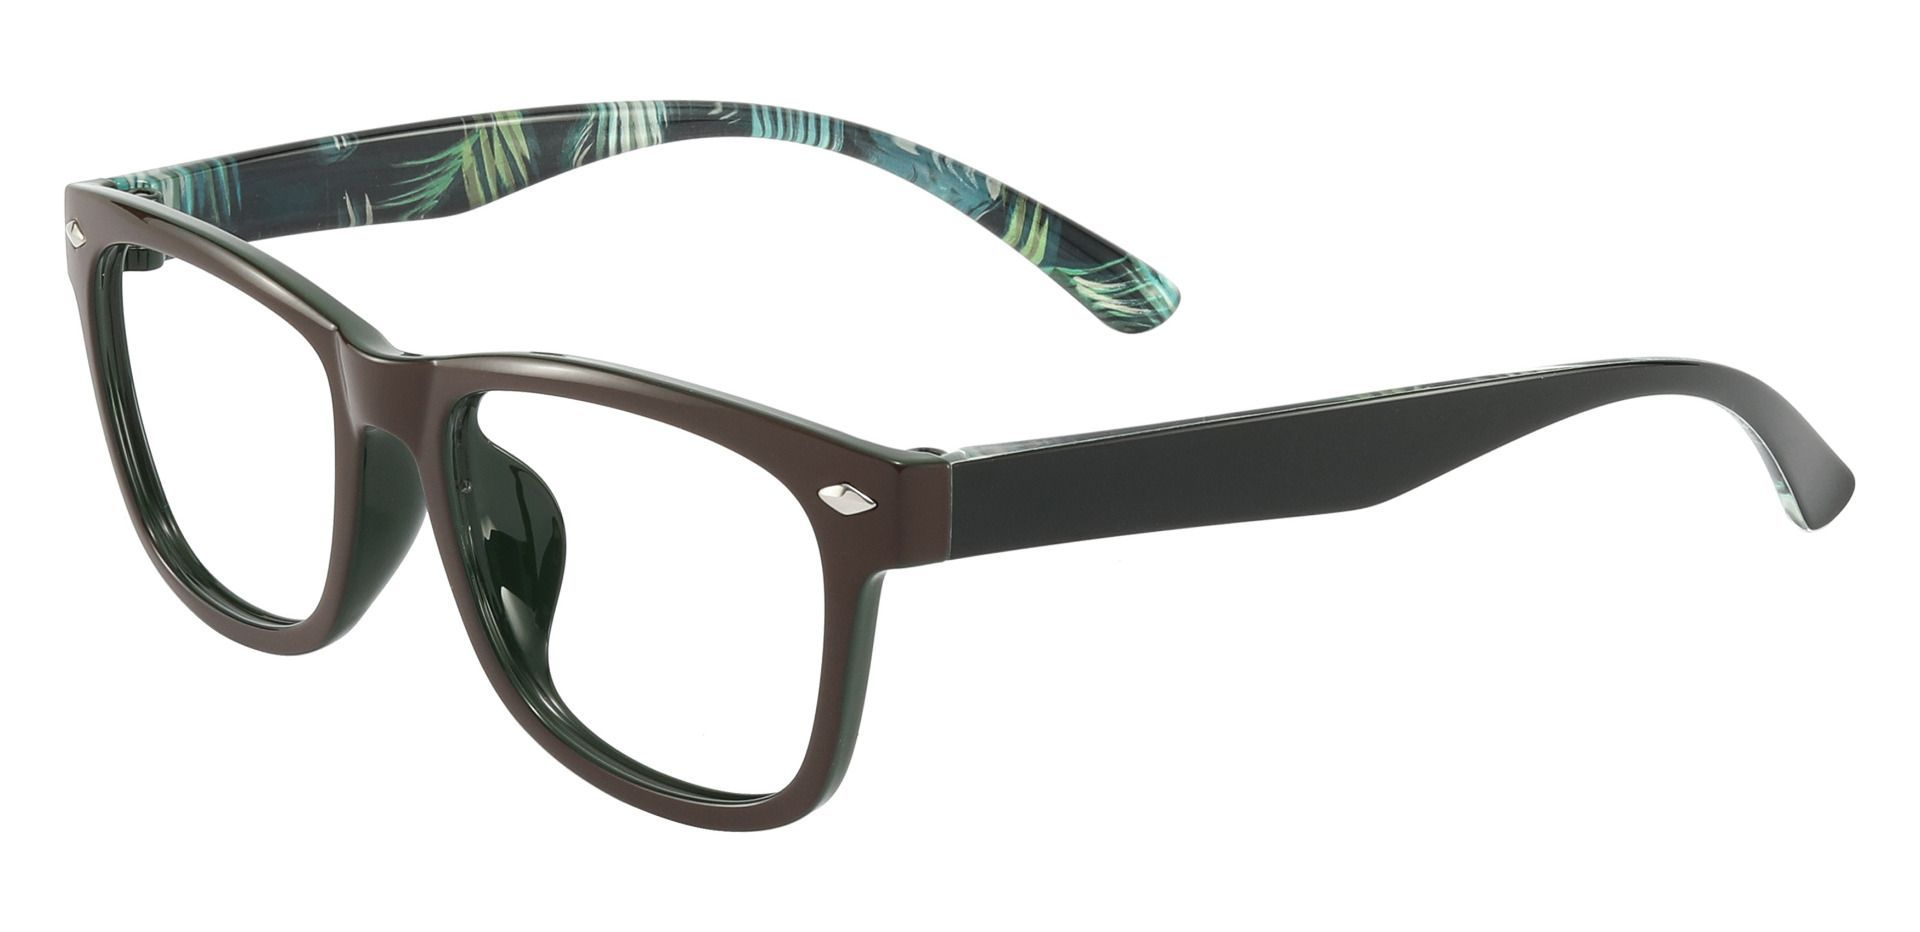 Shaler Square Prescription Glasses - Brown